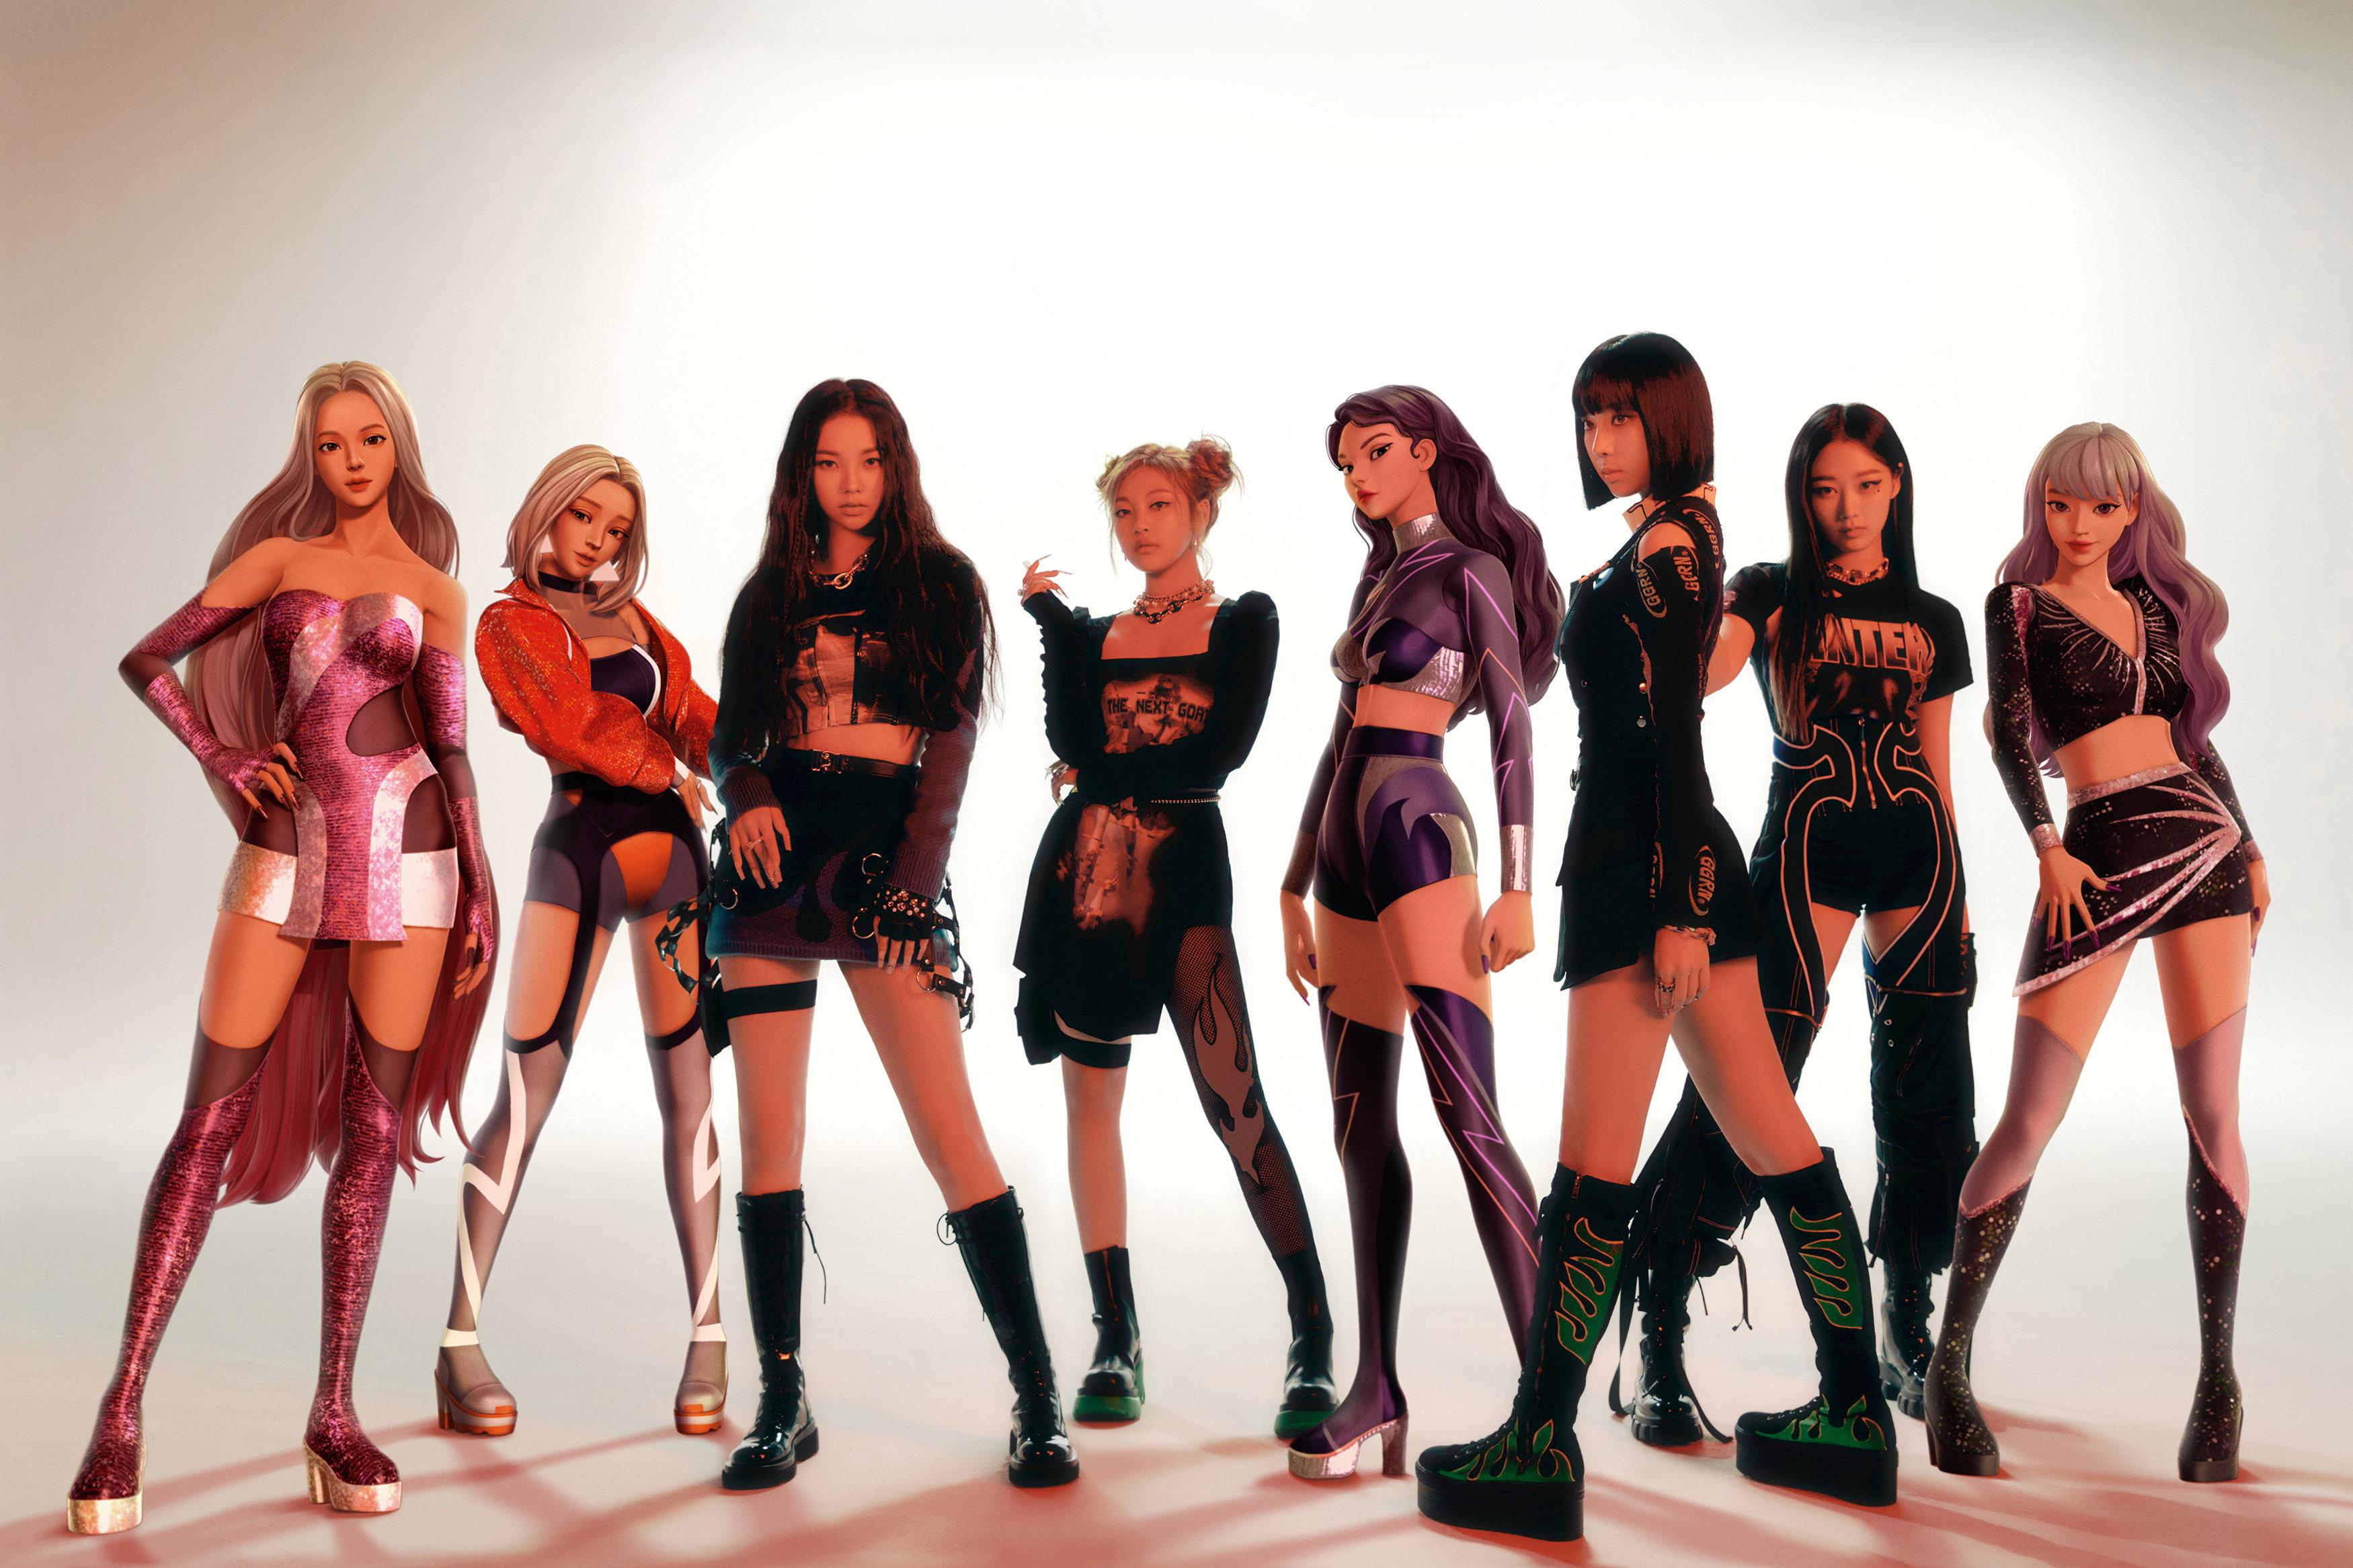 aespa Savage ae-aespa Teaser Photos (HD/HQ) - K-Pop Database / dbkpop.com